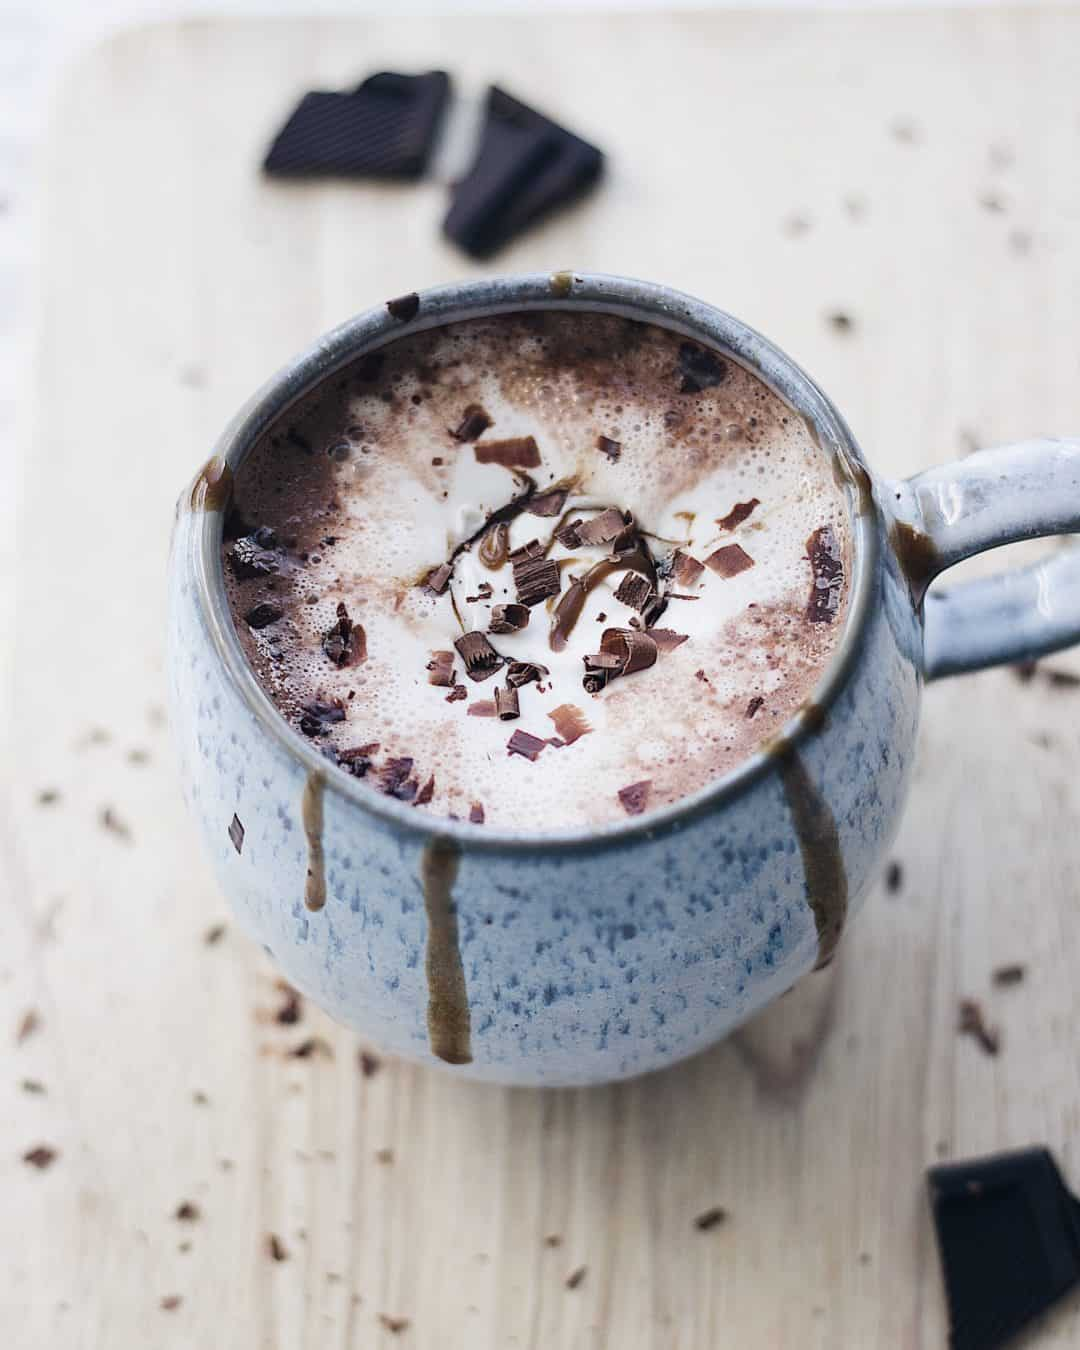 Vegan Creamy Oat Milk Hot Chocolate With Coconut Whipped Cream